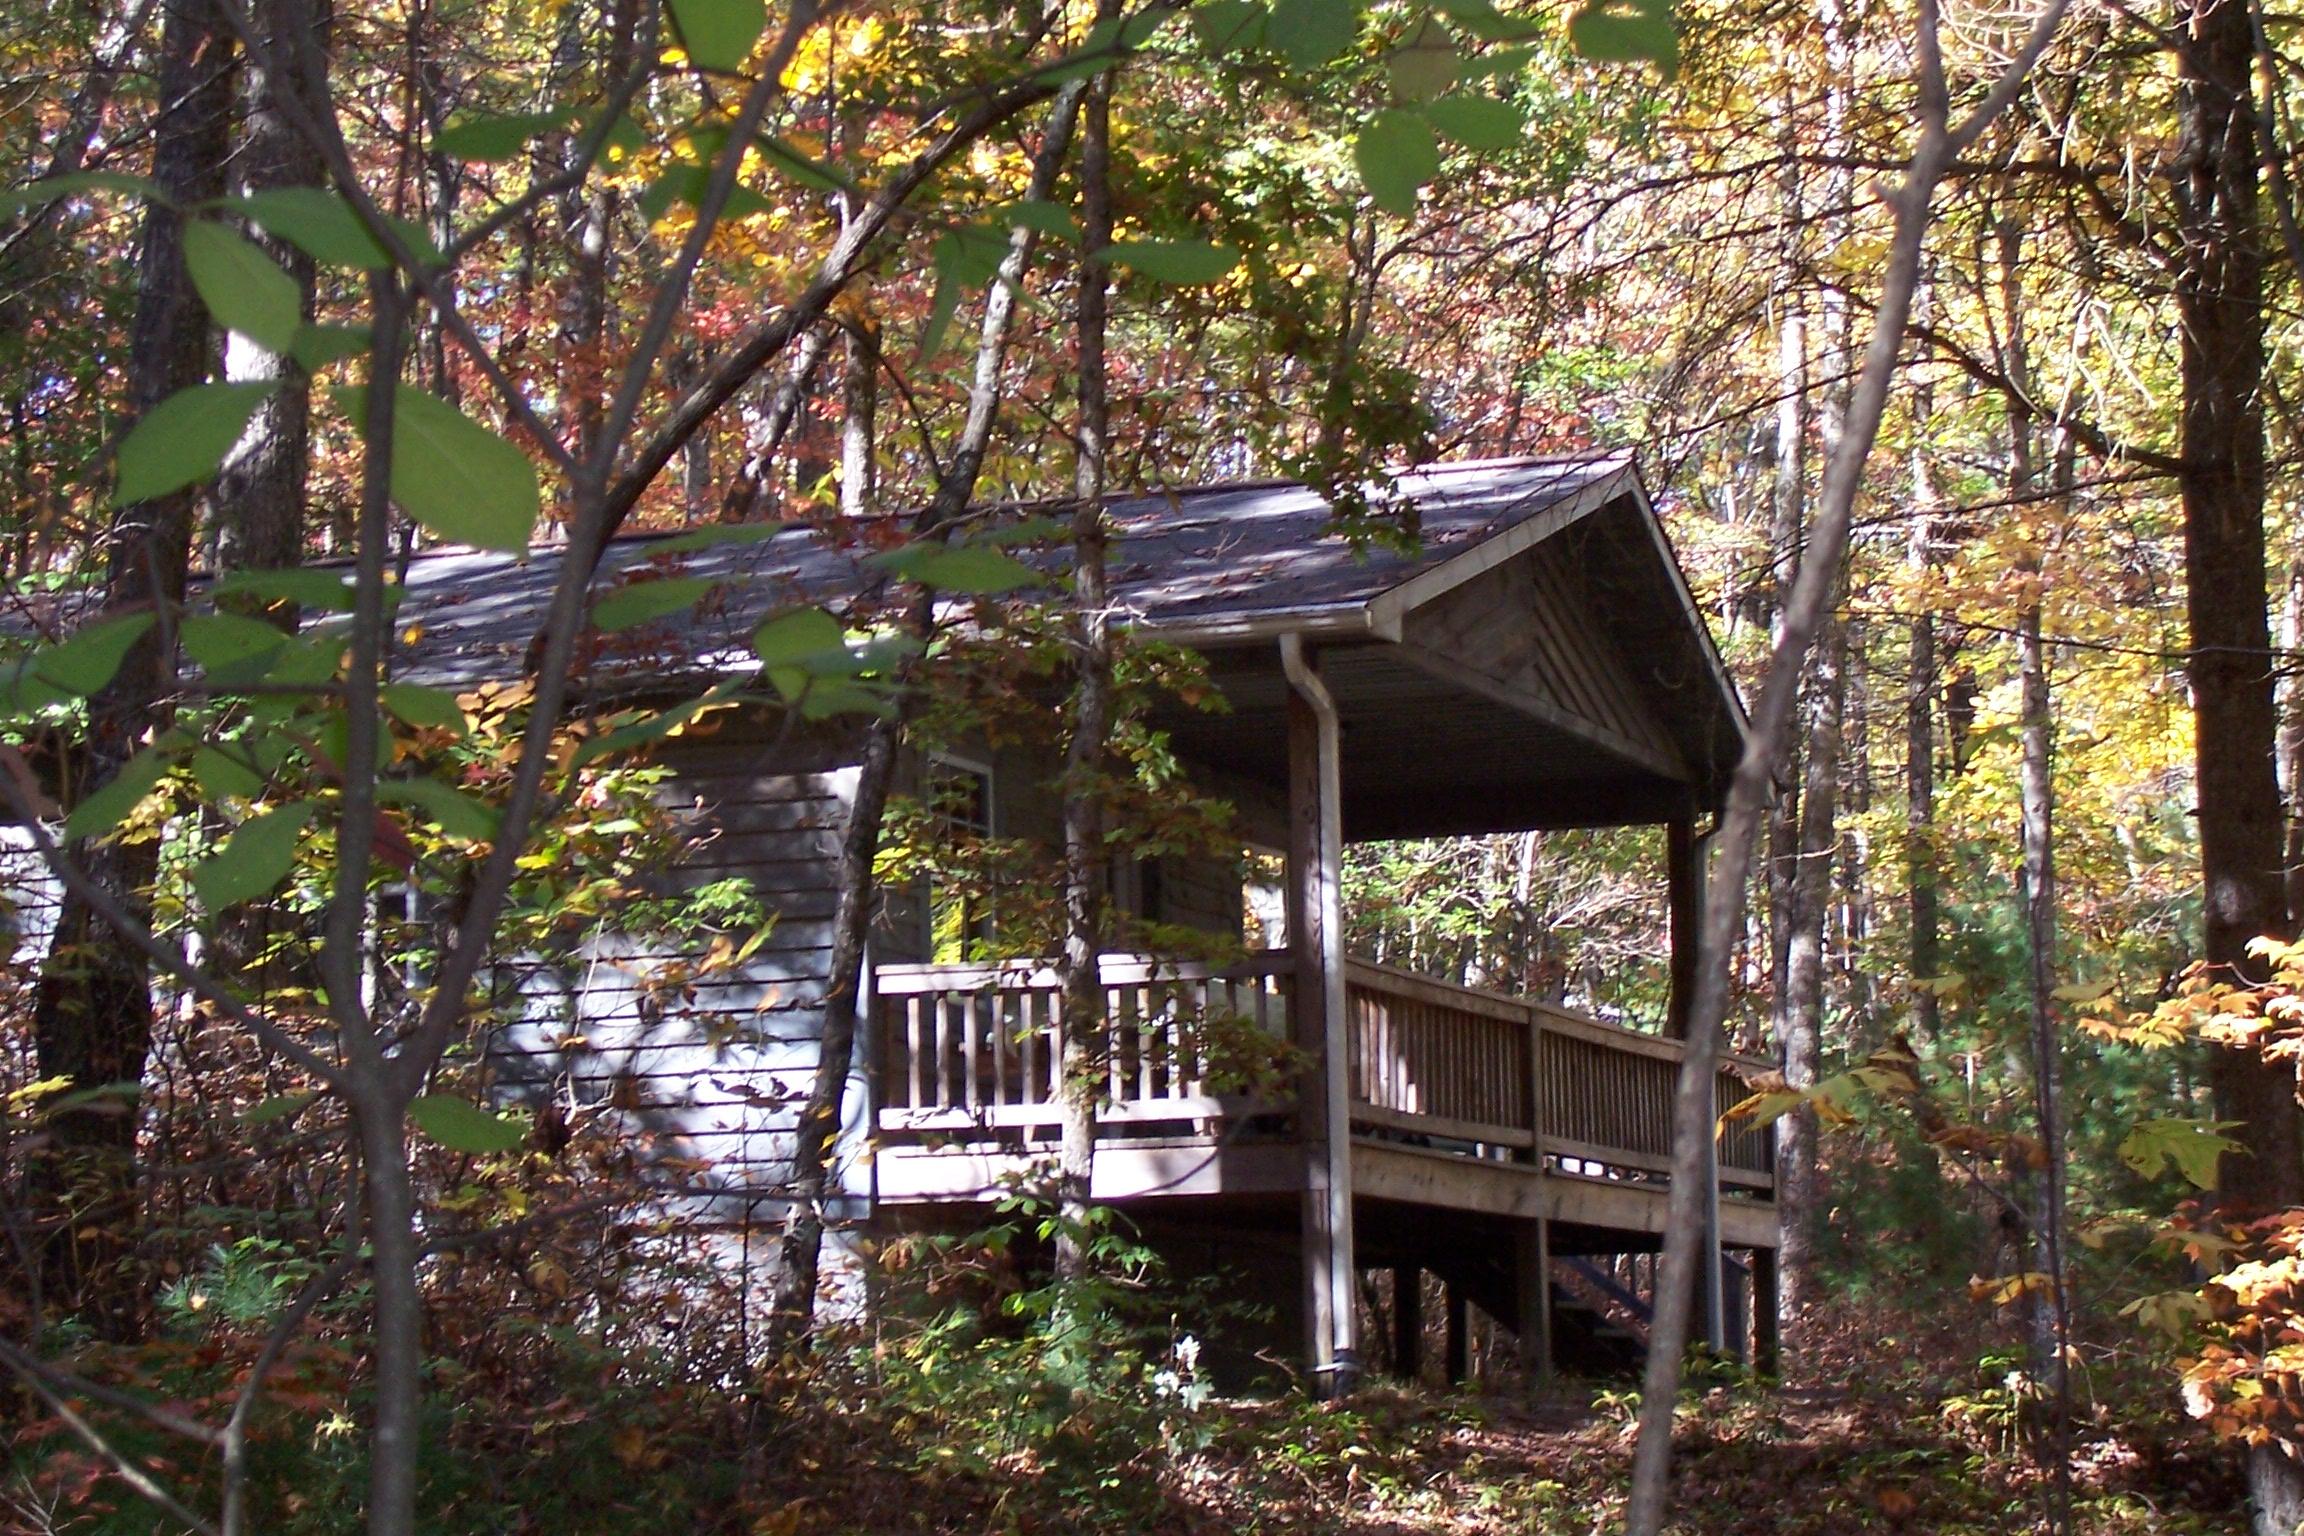 nc at brevard retreat blog fullsizerender in topics getaway cabins dog firefly woods friendly cabin latest